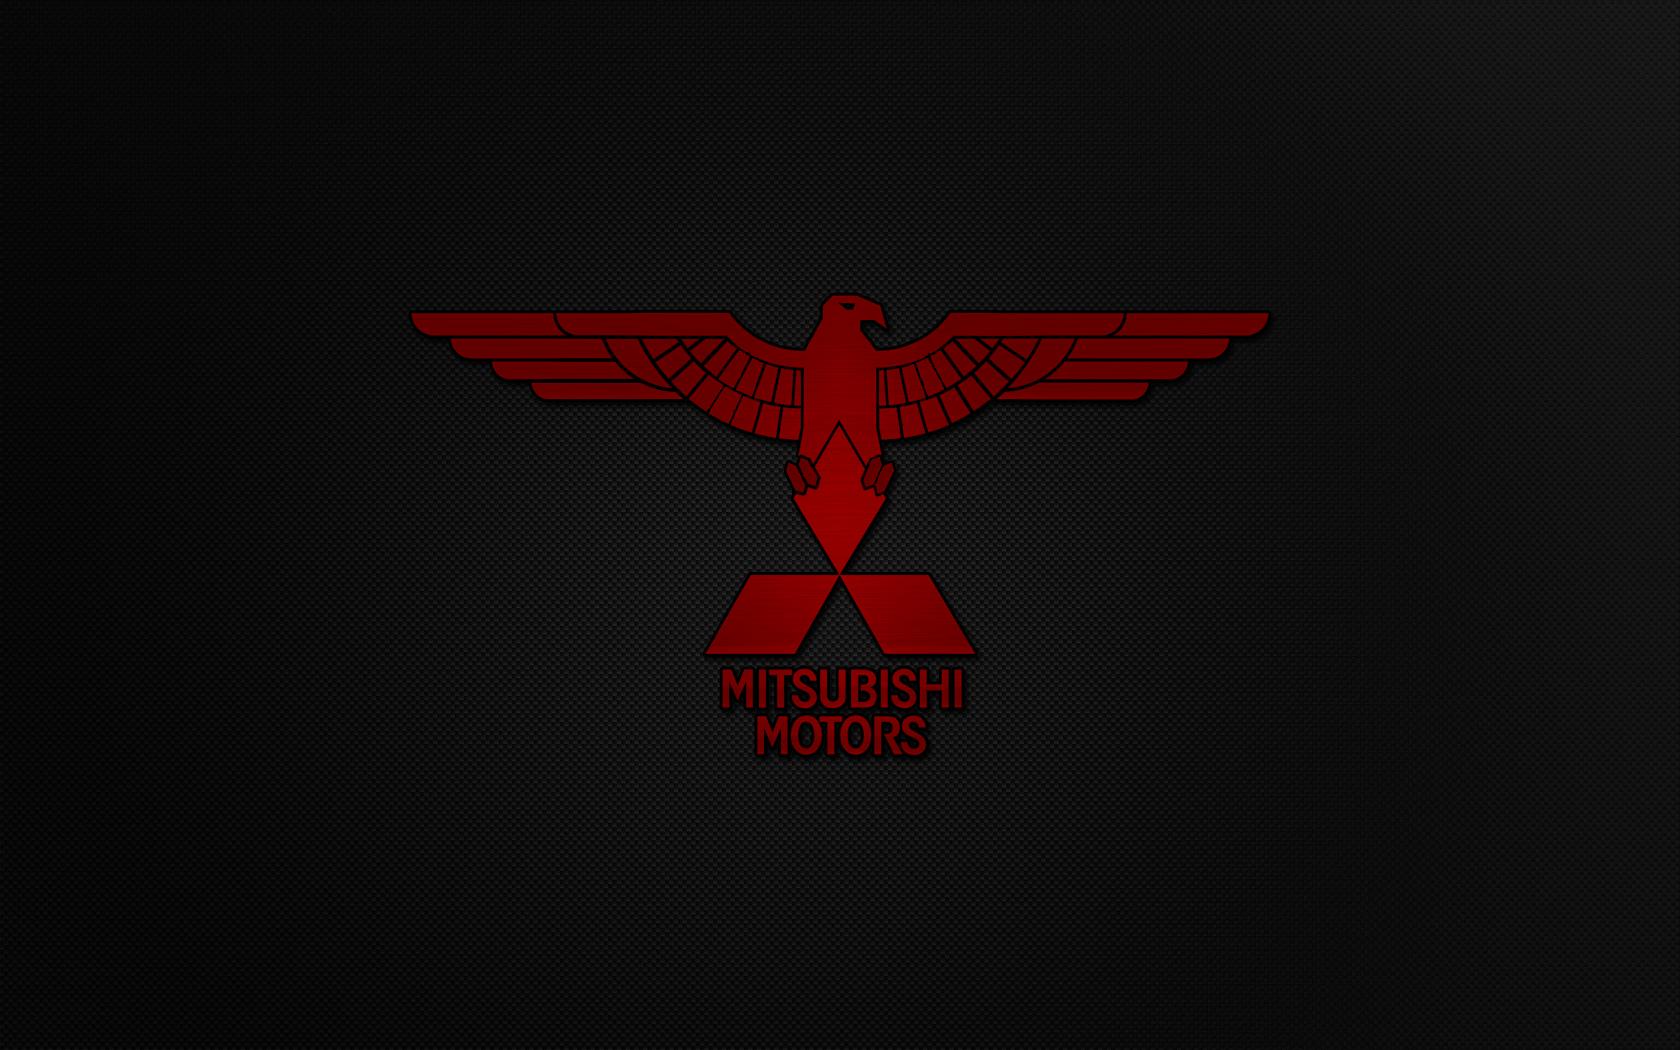 Mitsubishi Logo Wallpapers - Wallpaper Cave